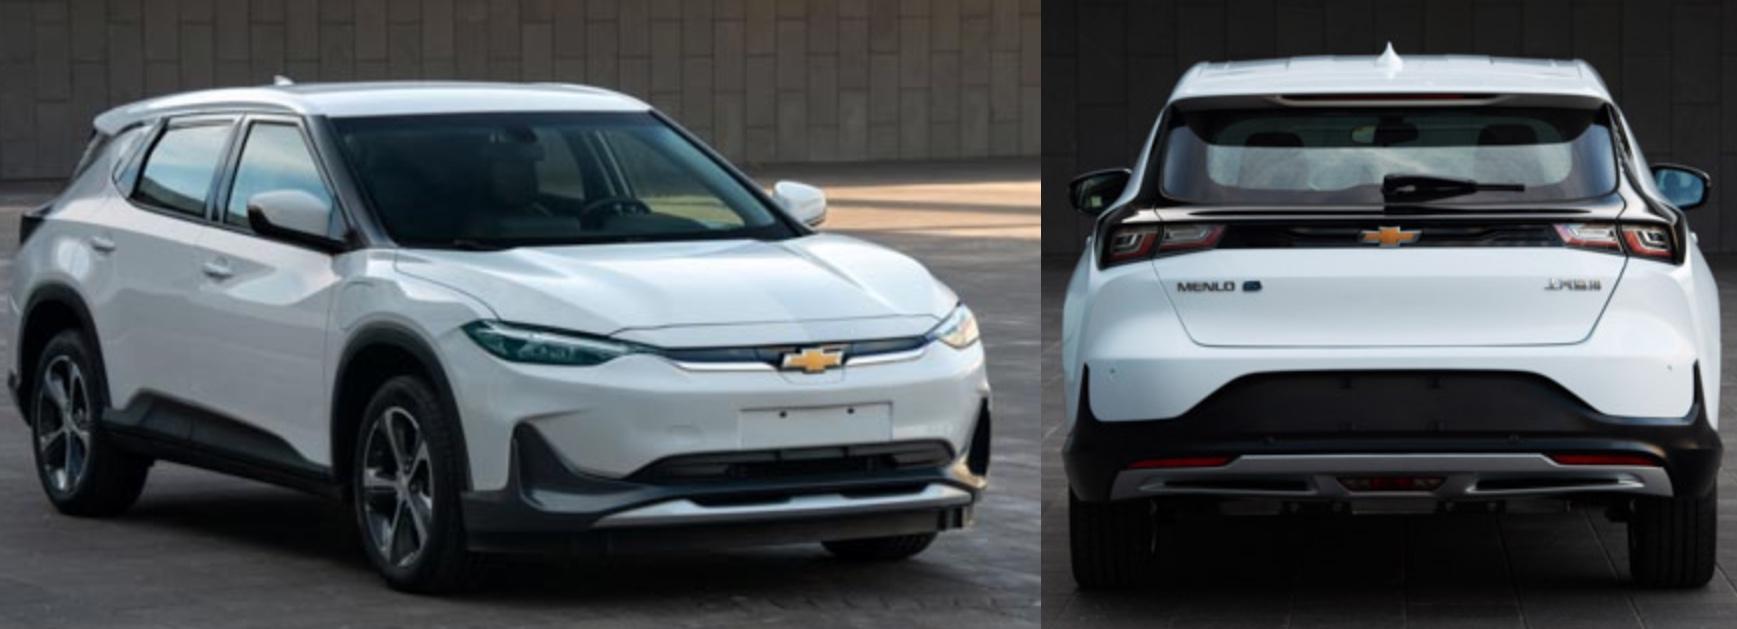 GM unveils Chevrolet Menlo EV electric car - a Bolt EV ...